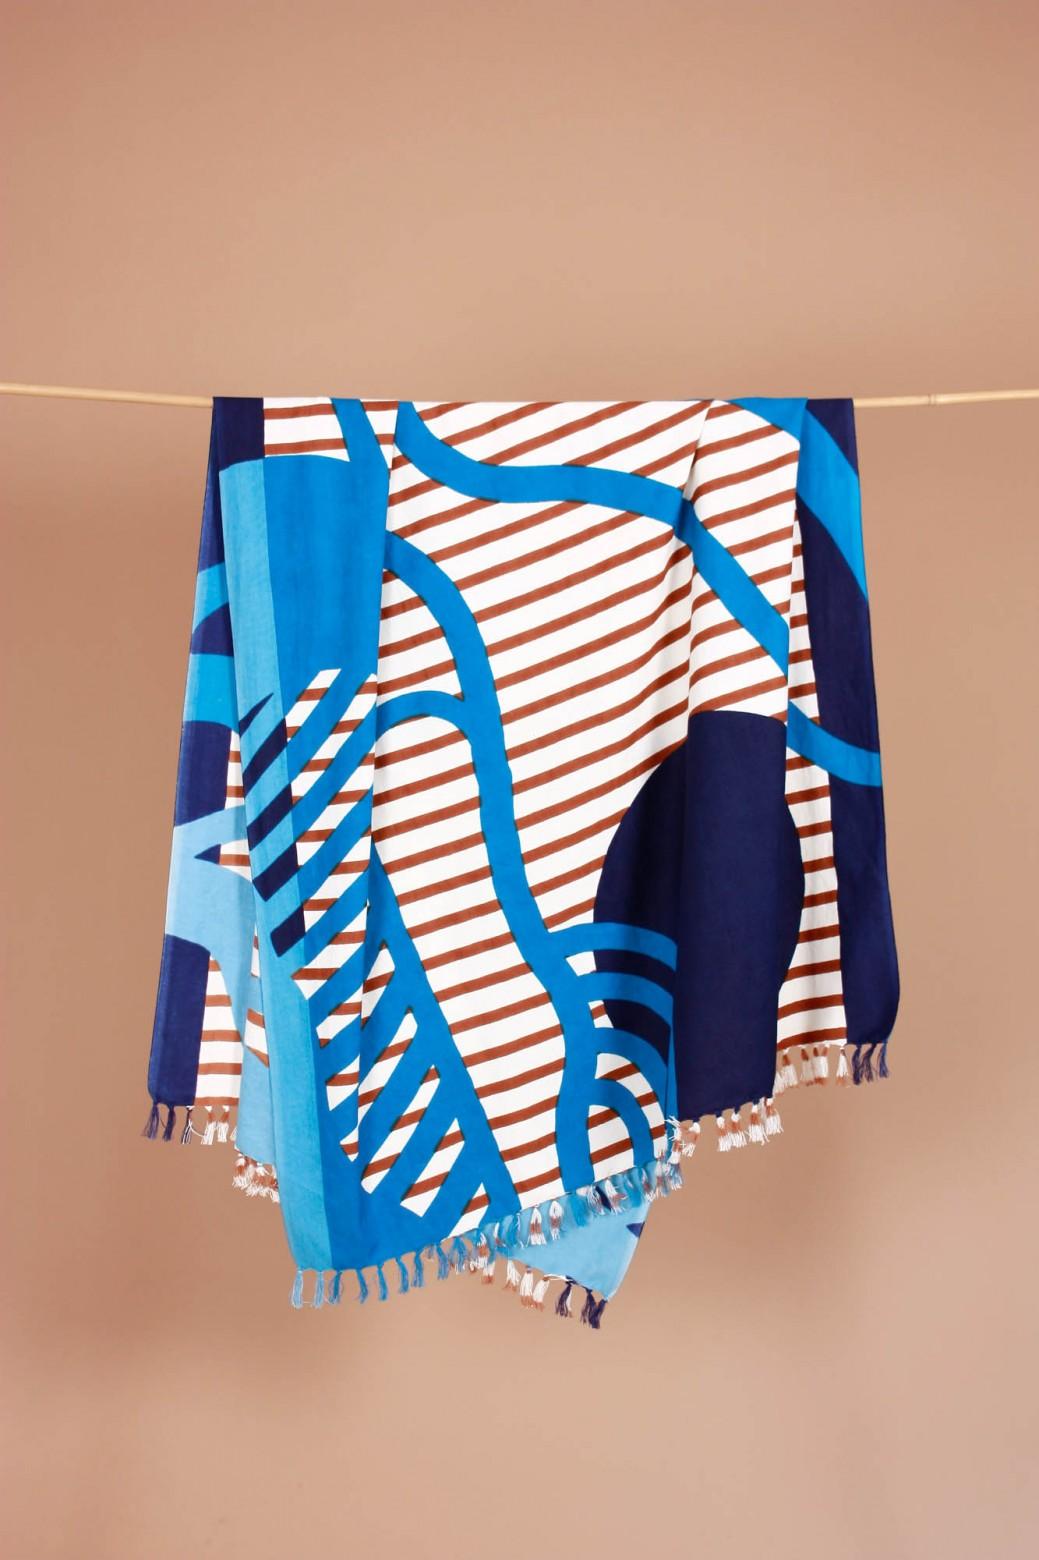 Soleil Couchant Blue Beach Towel